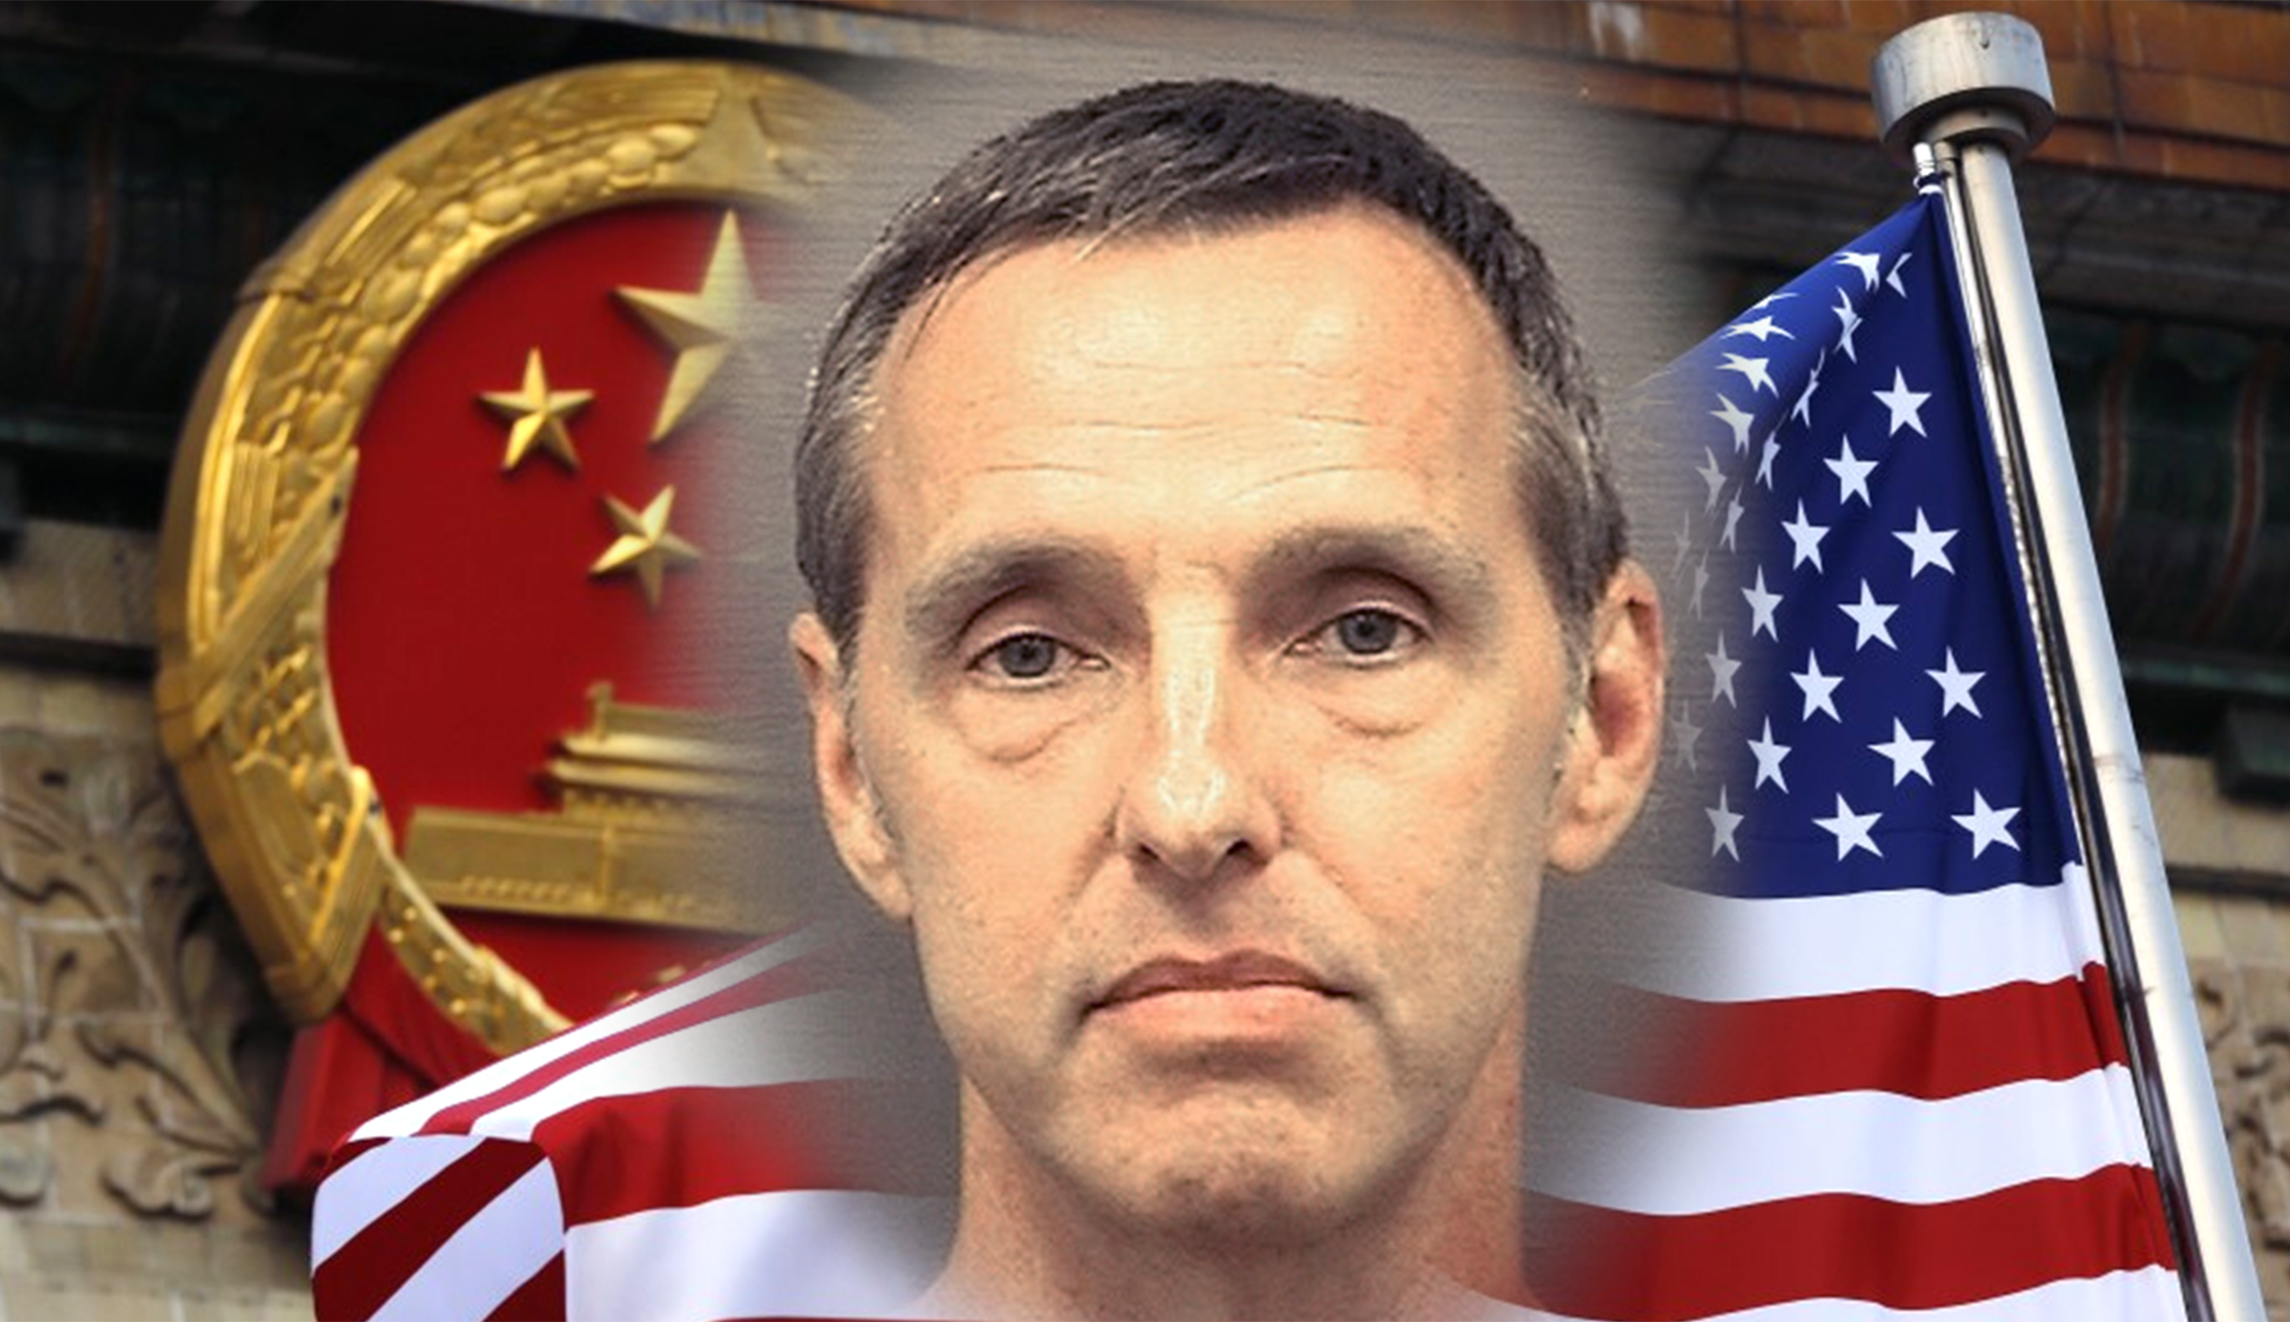 washingtonexaminer.com - China luring US intel veterans to leak government secrets with cash